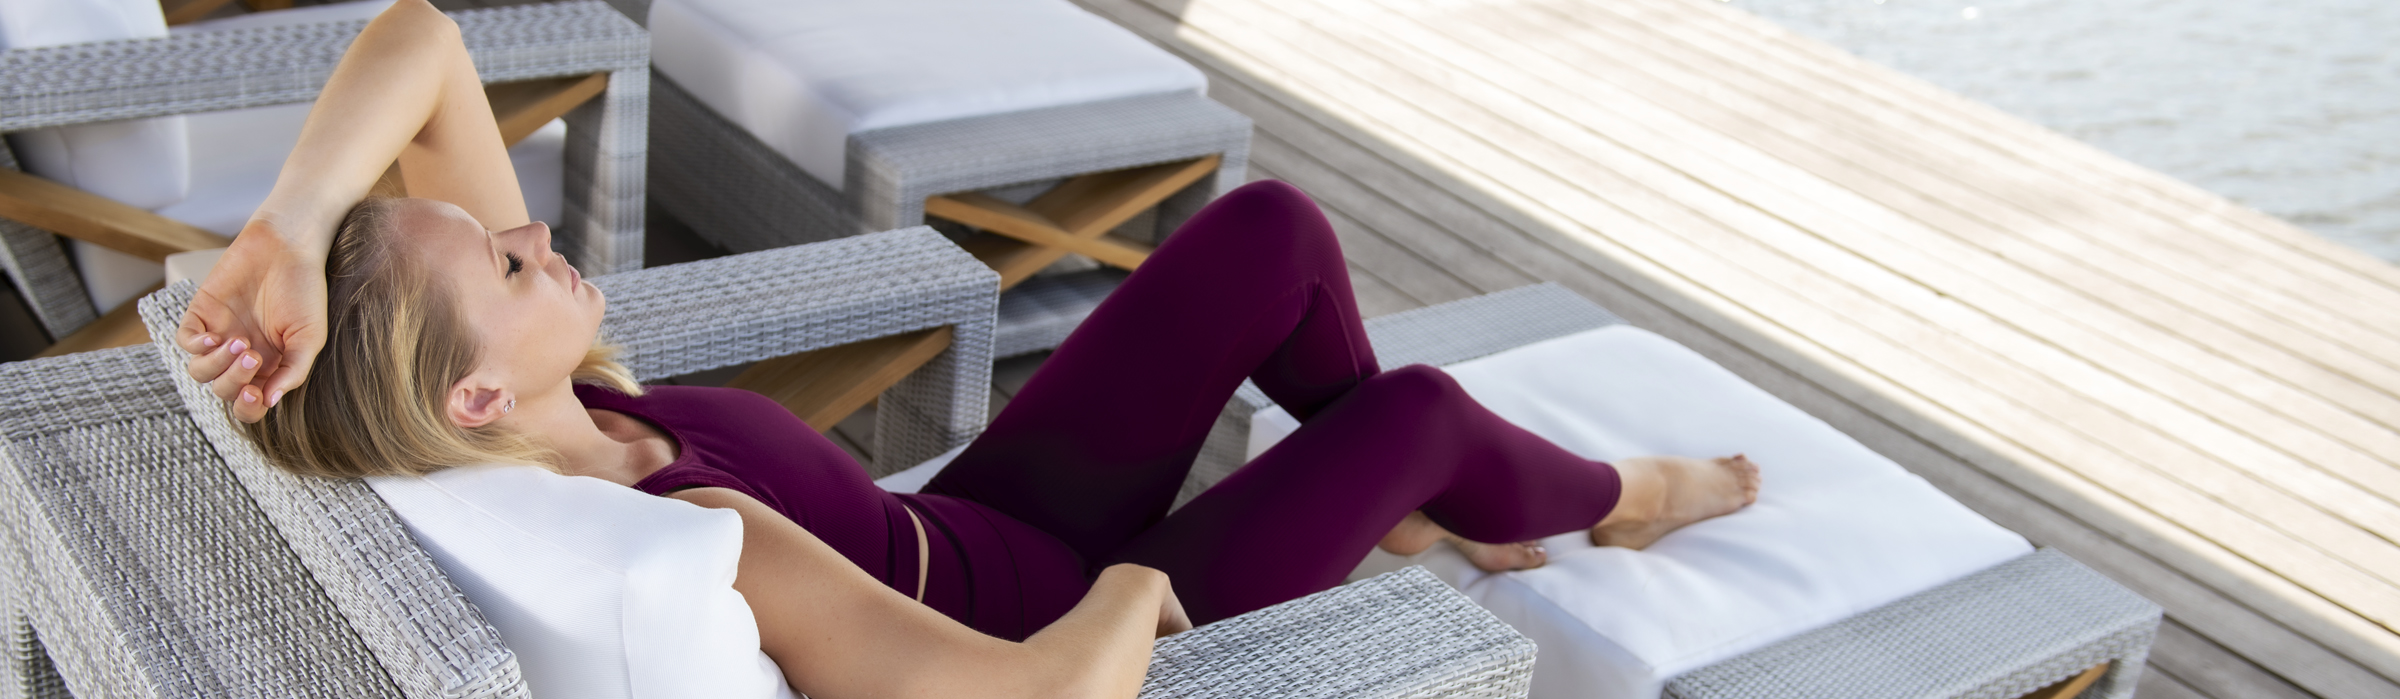 amenities-pavilion-post-yoga